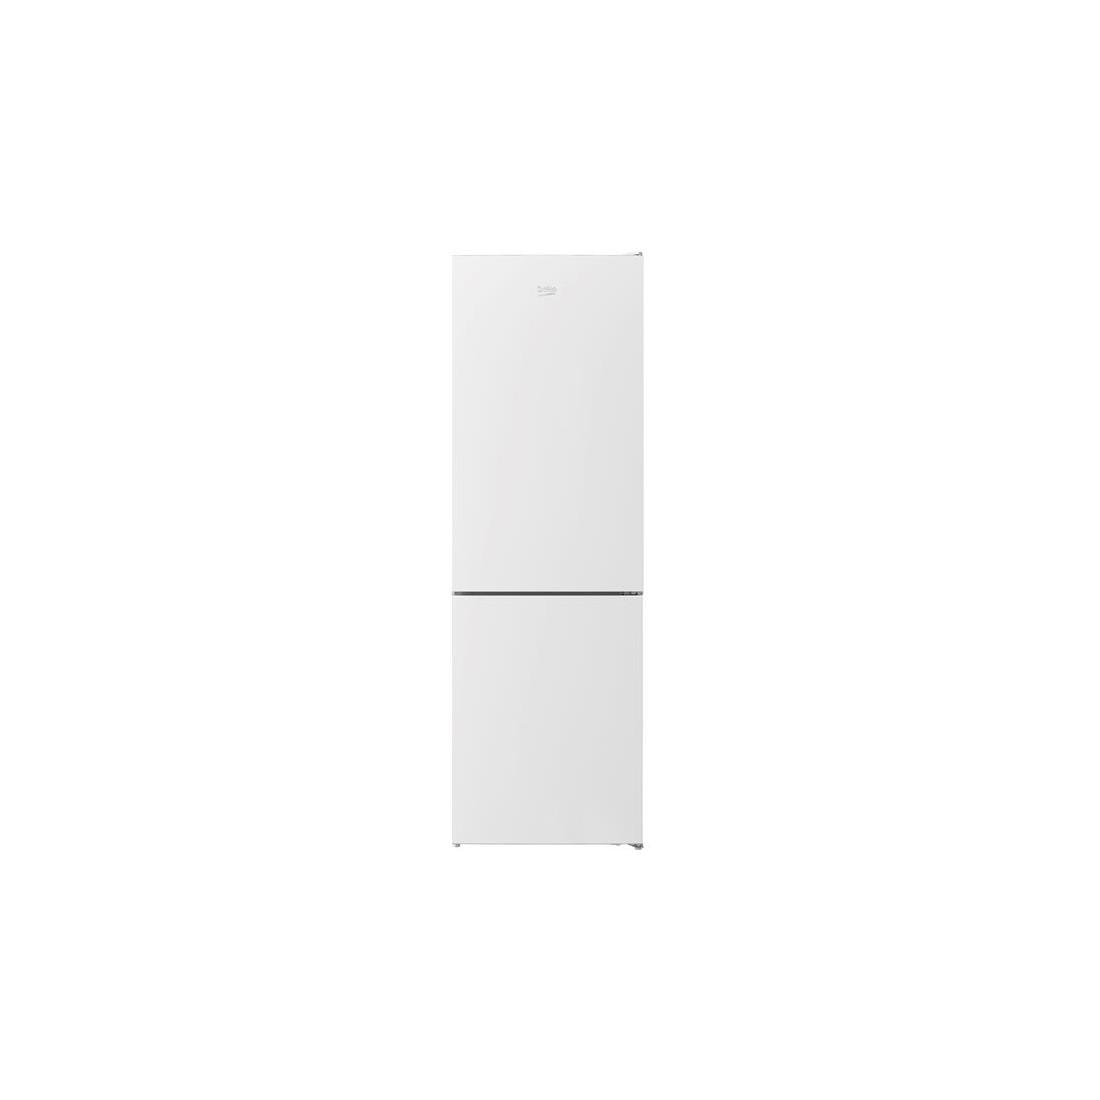 Combi Libre Instalación - Beko RCNA366K34WN, Eficiencia A+, Blanco, Sin dispensador, No-Frost